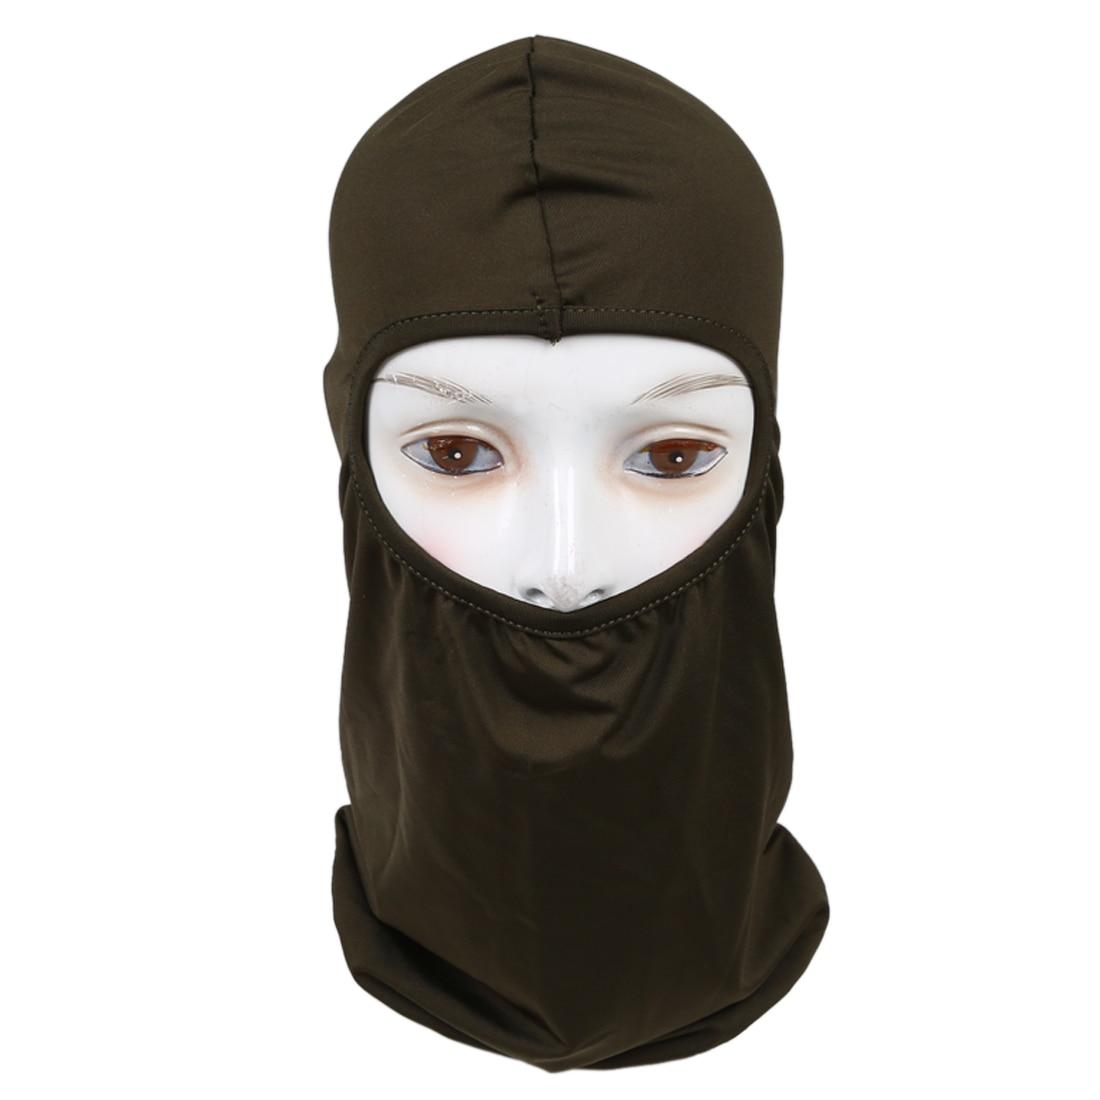 2x Ultra Thin Ski Bike Bicycle Face Mask Sports Football Helmet Army Green